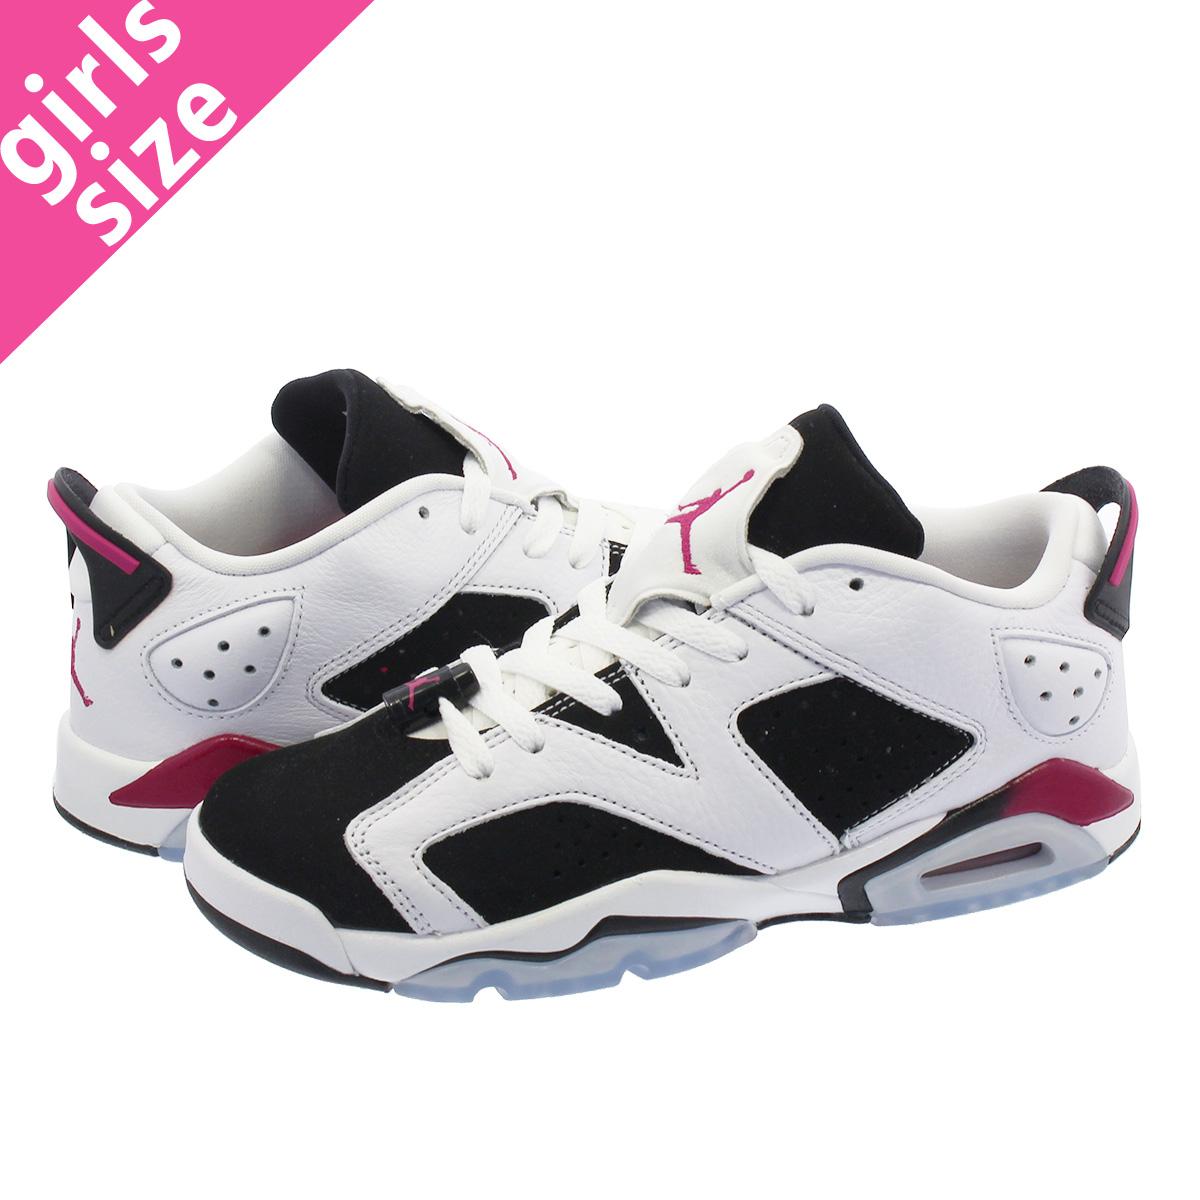 f3cd320051fb NIKE AIR JORDAN 6 RETRO LOW GG Nike Air Jordan 6 nostalgic low GG  WHITE FUCHSIA BLACK 768